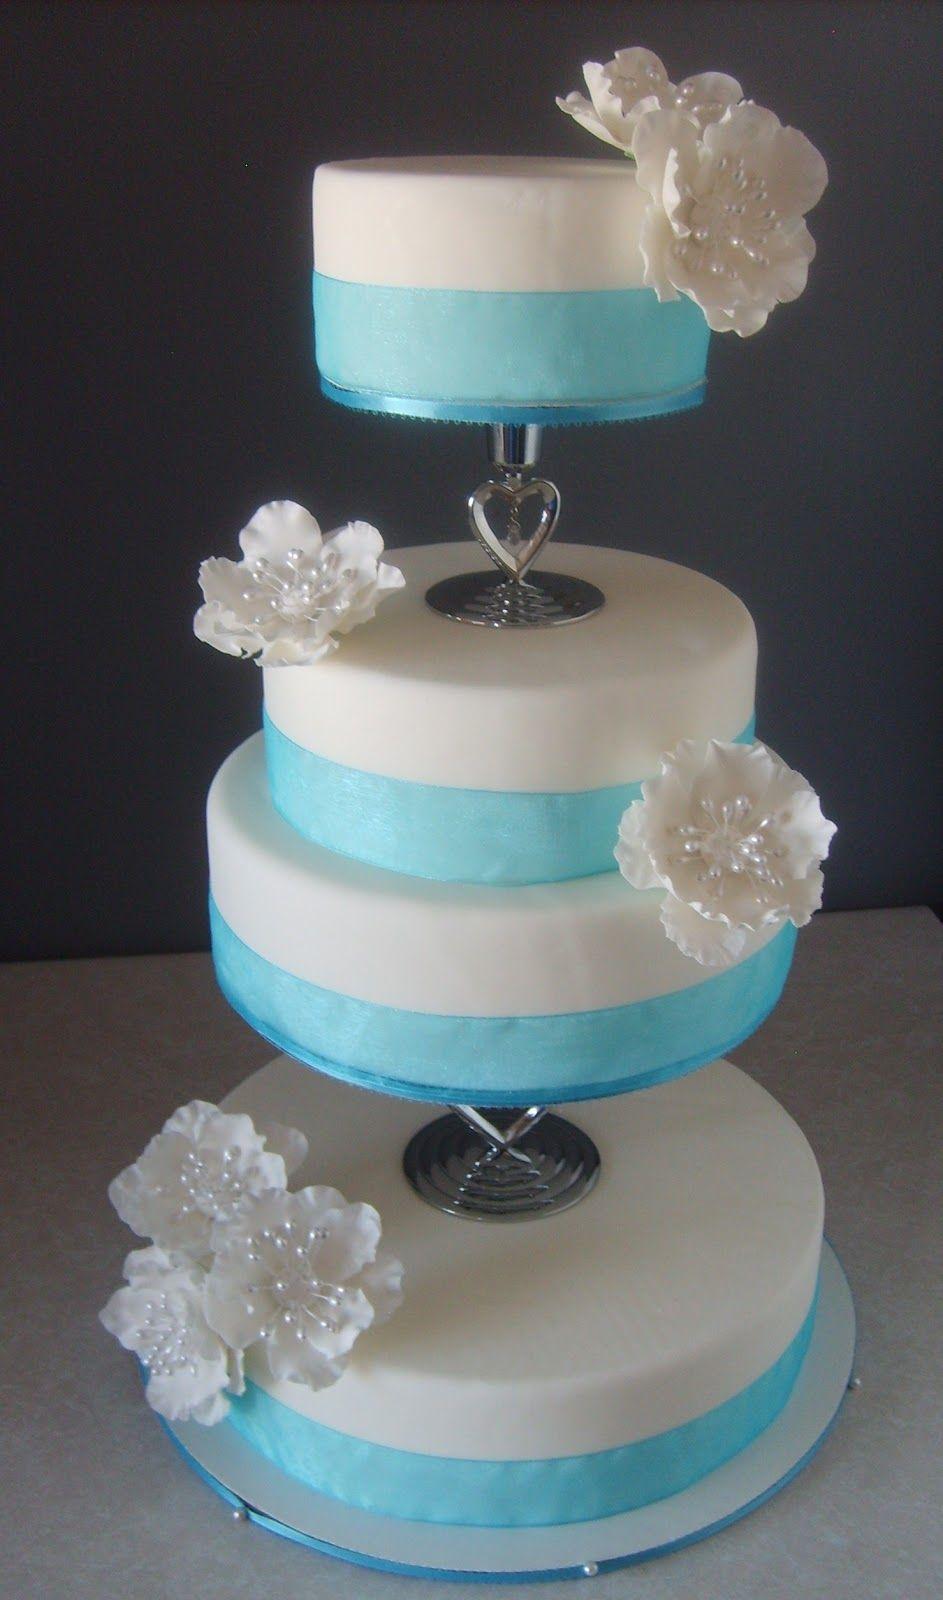 Elegant Navy Blue, White And Pink Wedding Cake ... |Pink And Blue Wedding Cakes